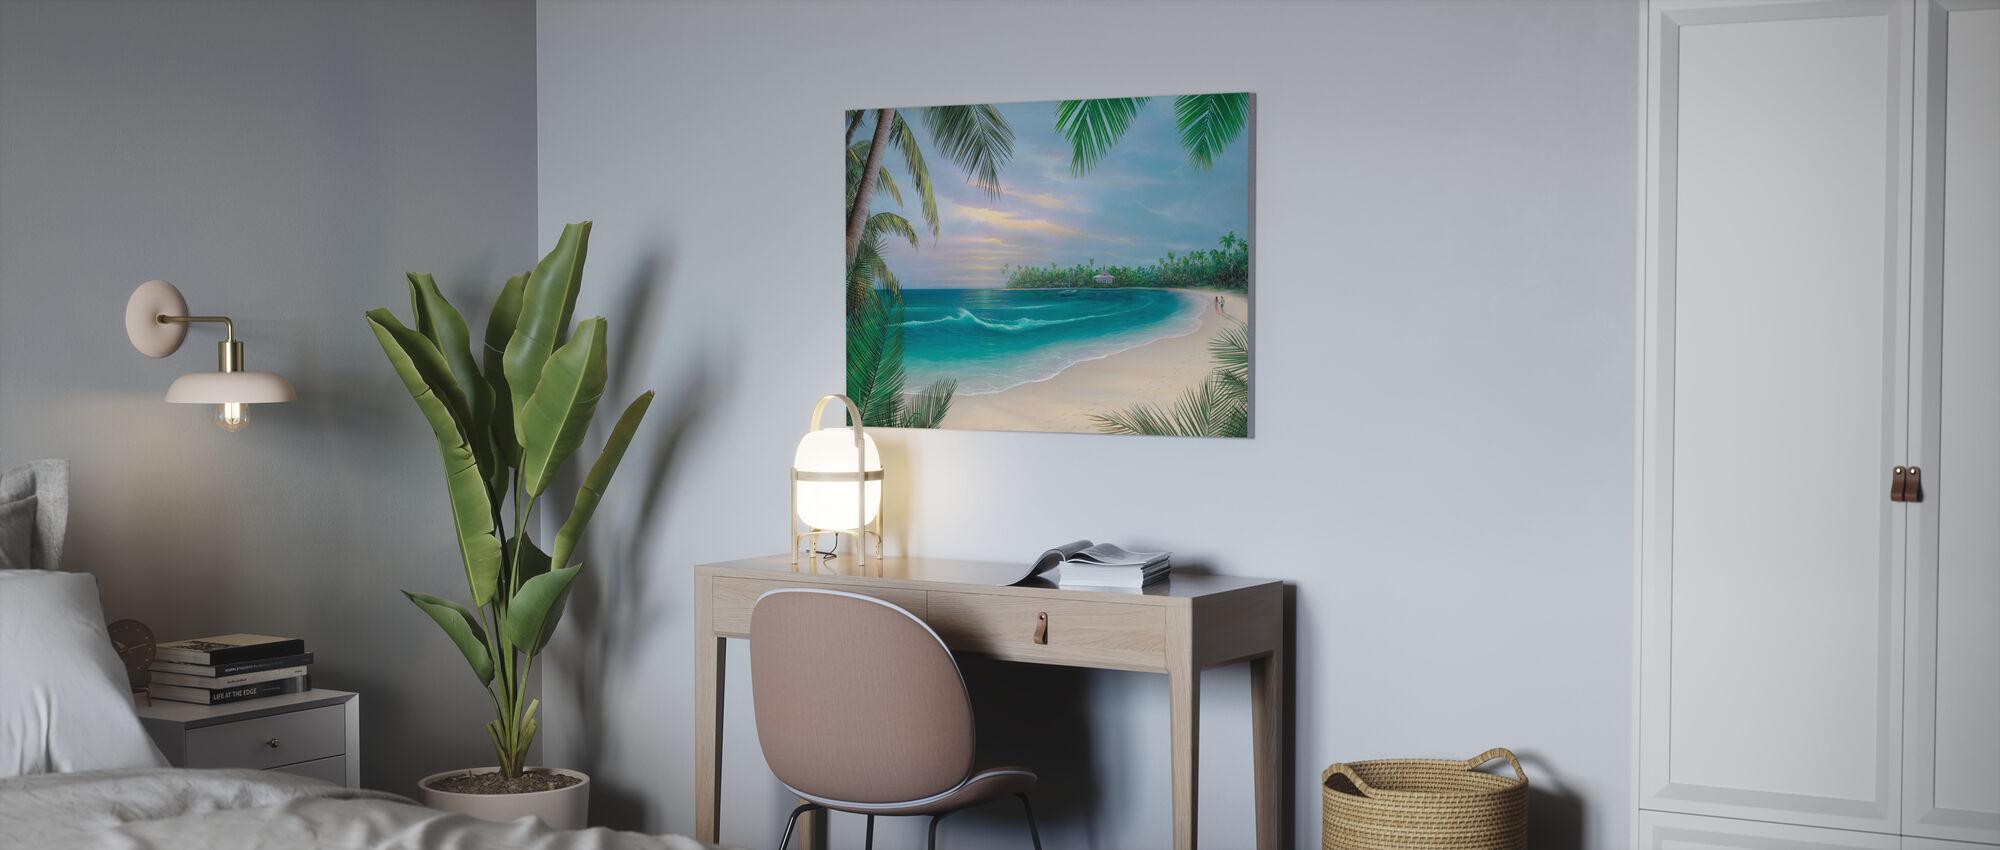 Beach House Rendezvous - Canvas print - Kantoor